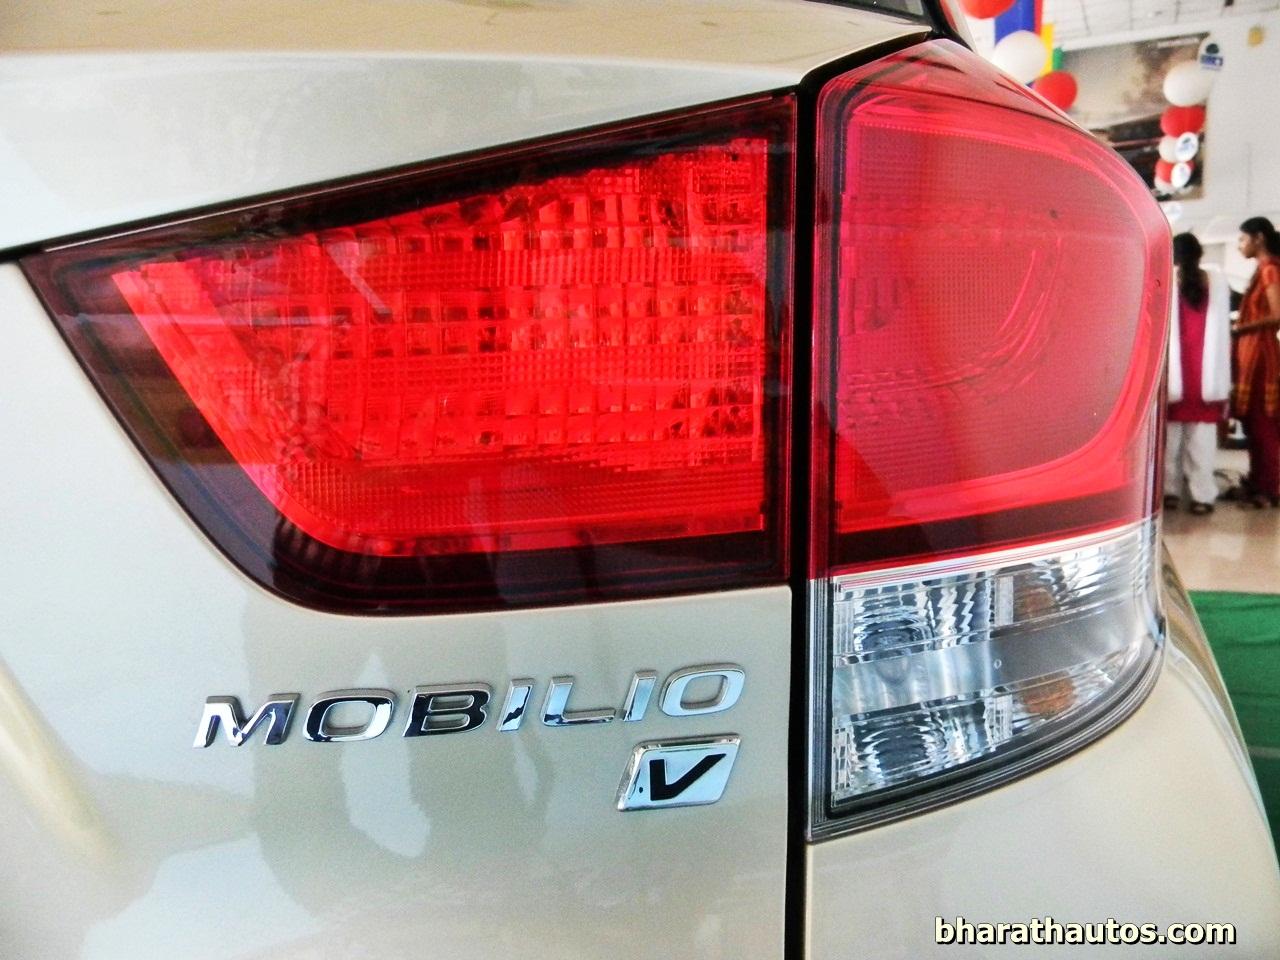 Honda Mobilio Taillights Bharathautos Automobile News Updates